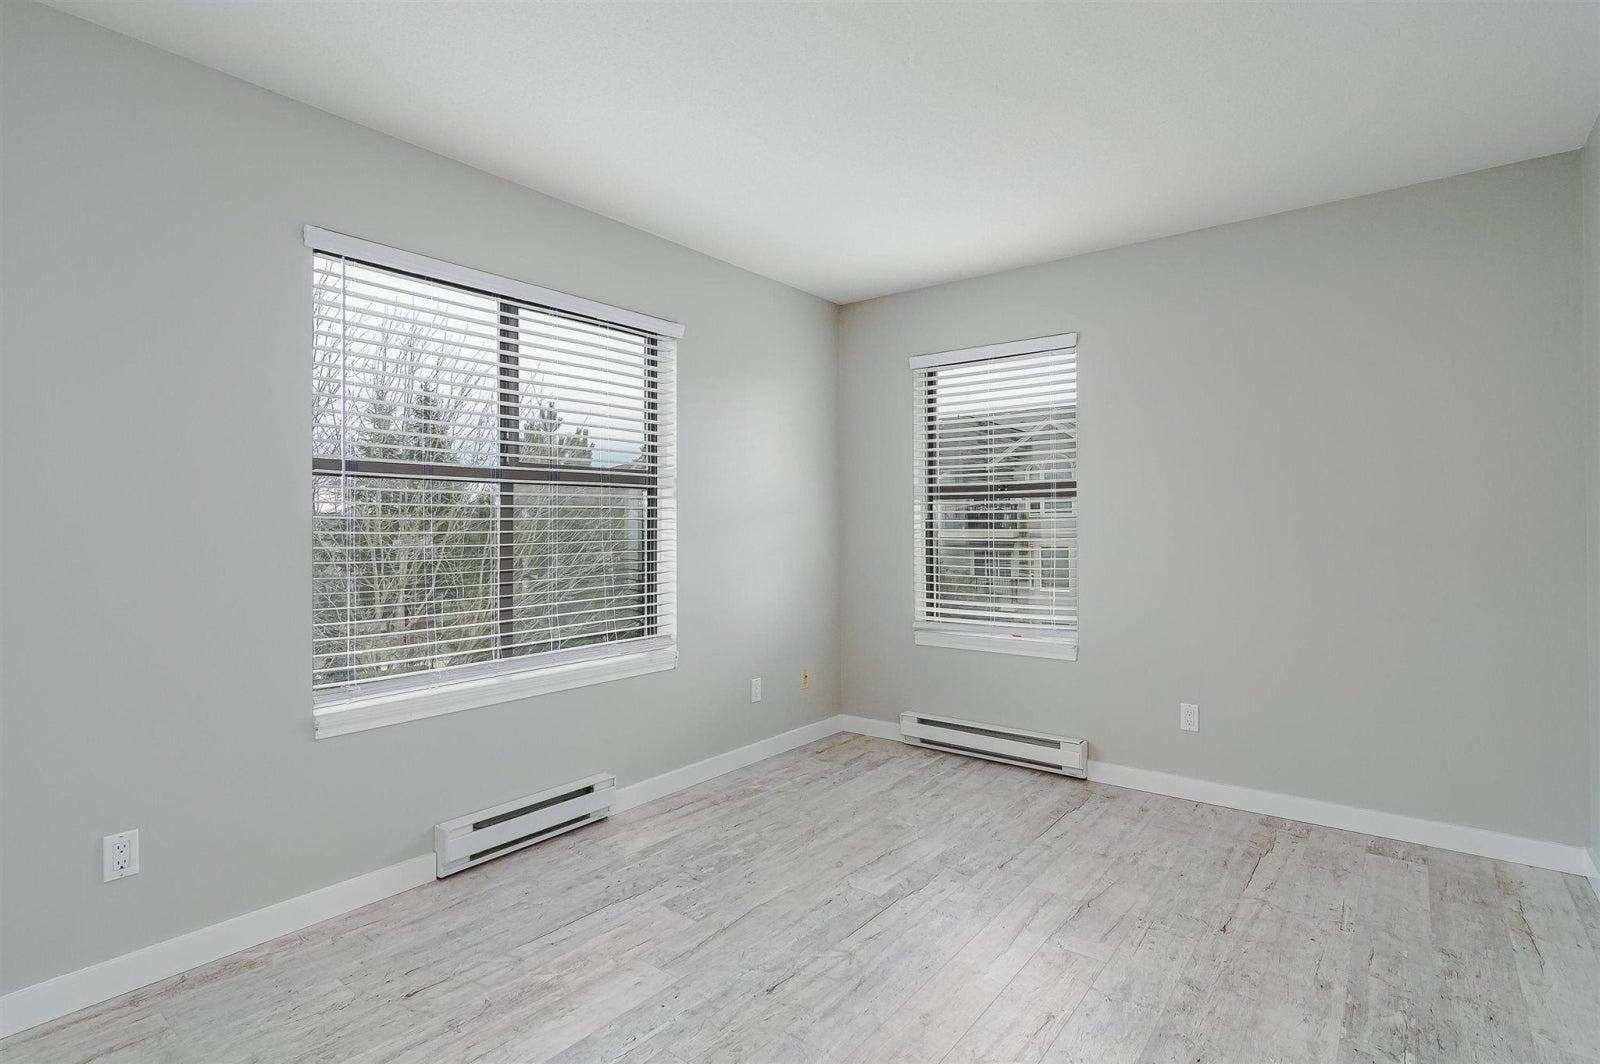 405 20268 54 AVENUE - Langley City Apartment/Condo for sale, 2 Bedrooms (R2604183) #14